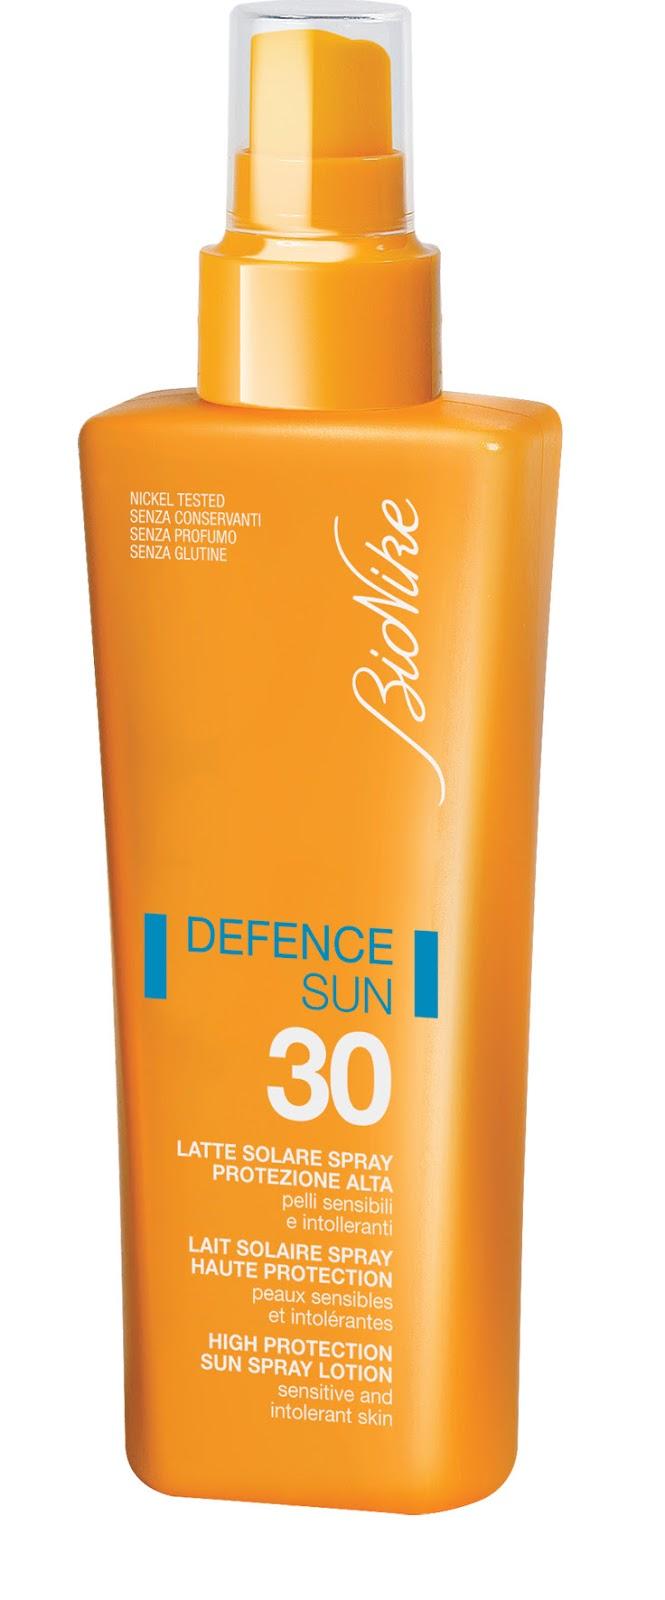 Bionike Defence Sun Latte Solare